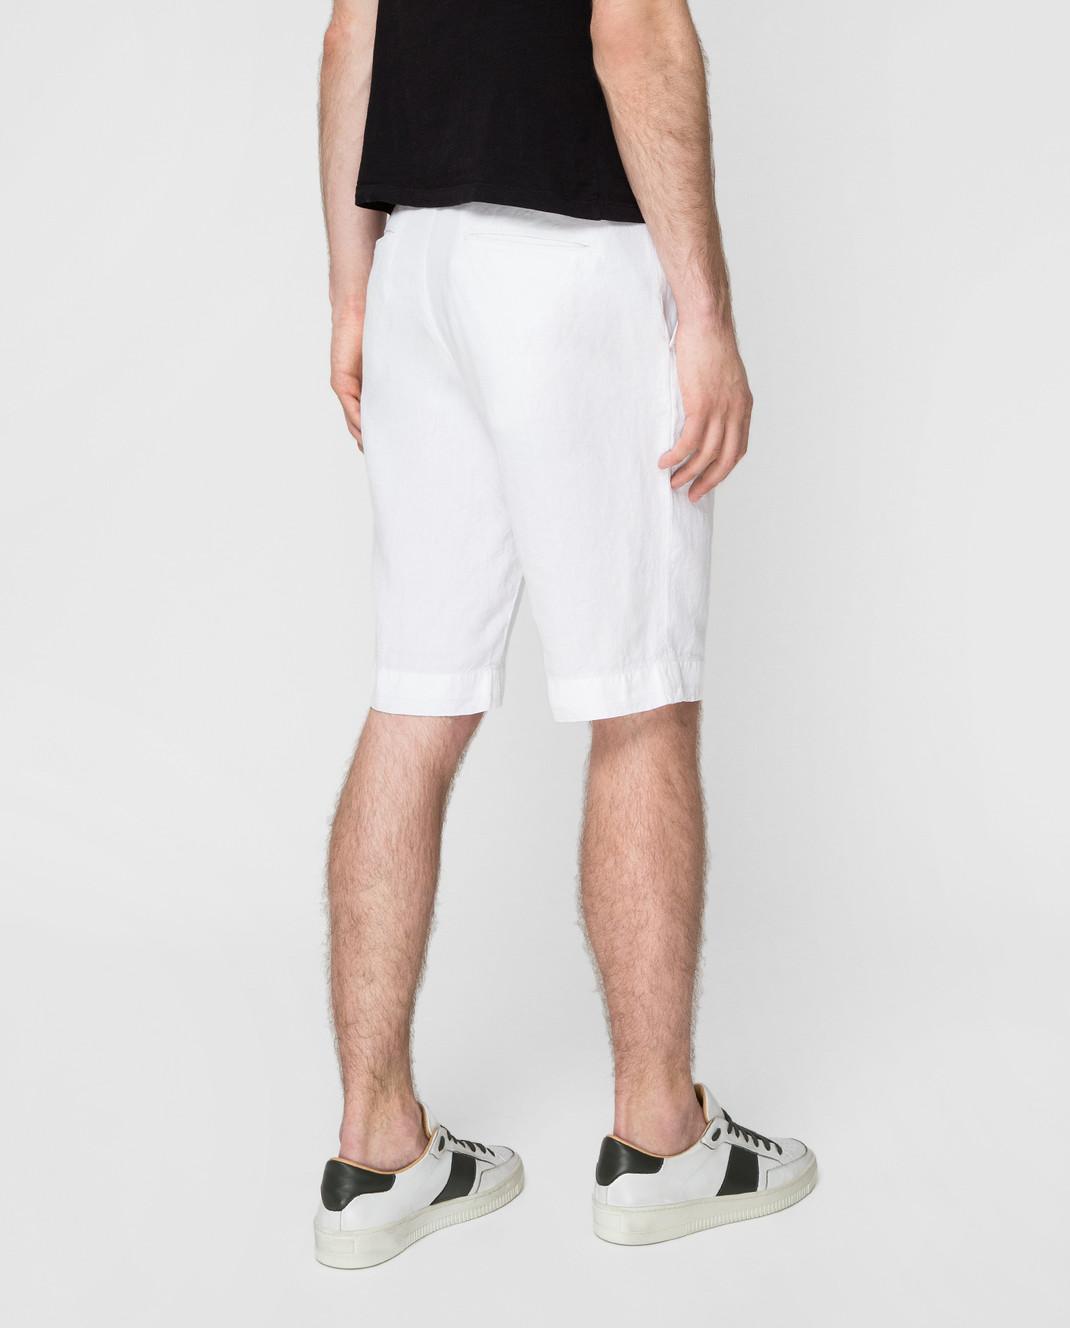 Kiton Белые шорты UPNJSBJ07R66 изображение 4